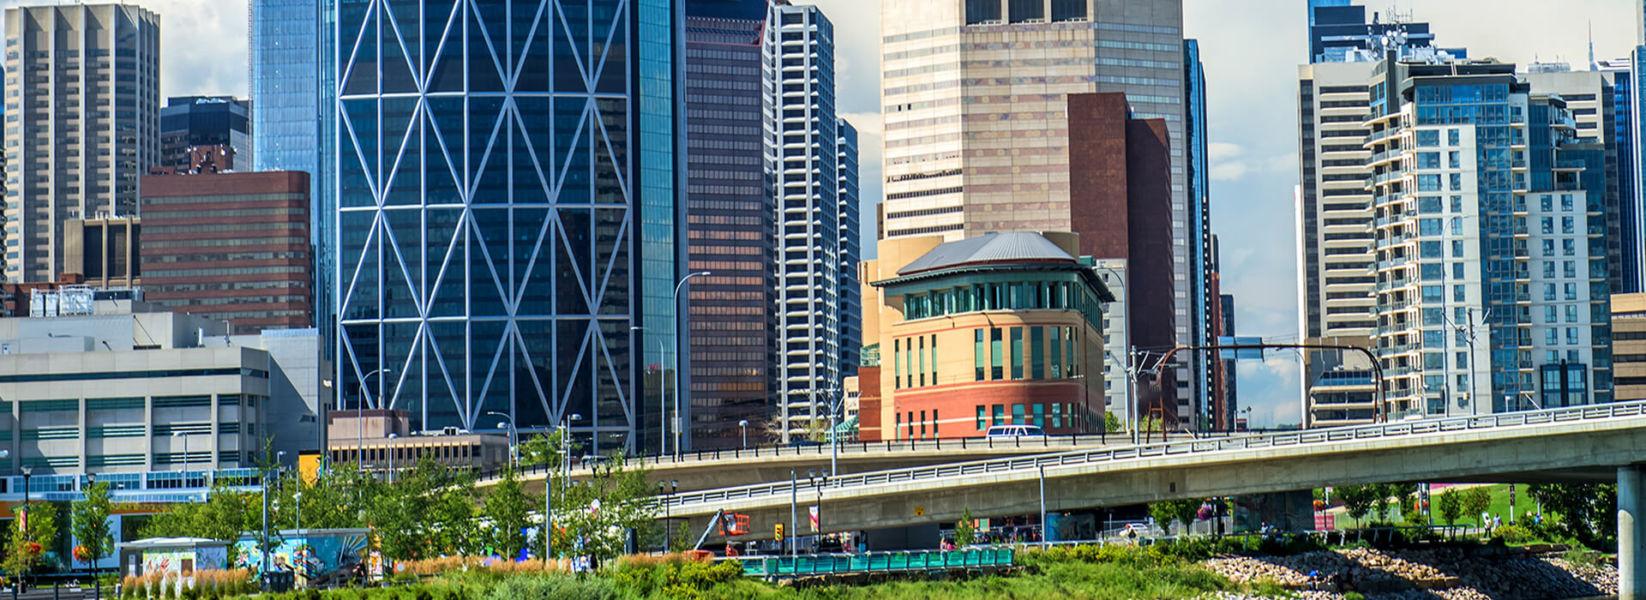 Calgary Header Image